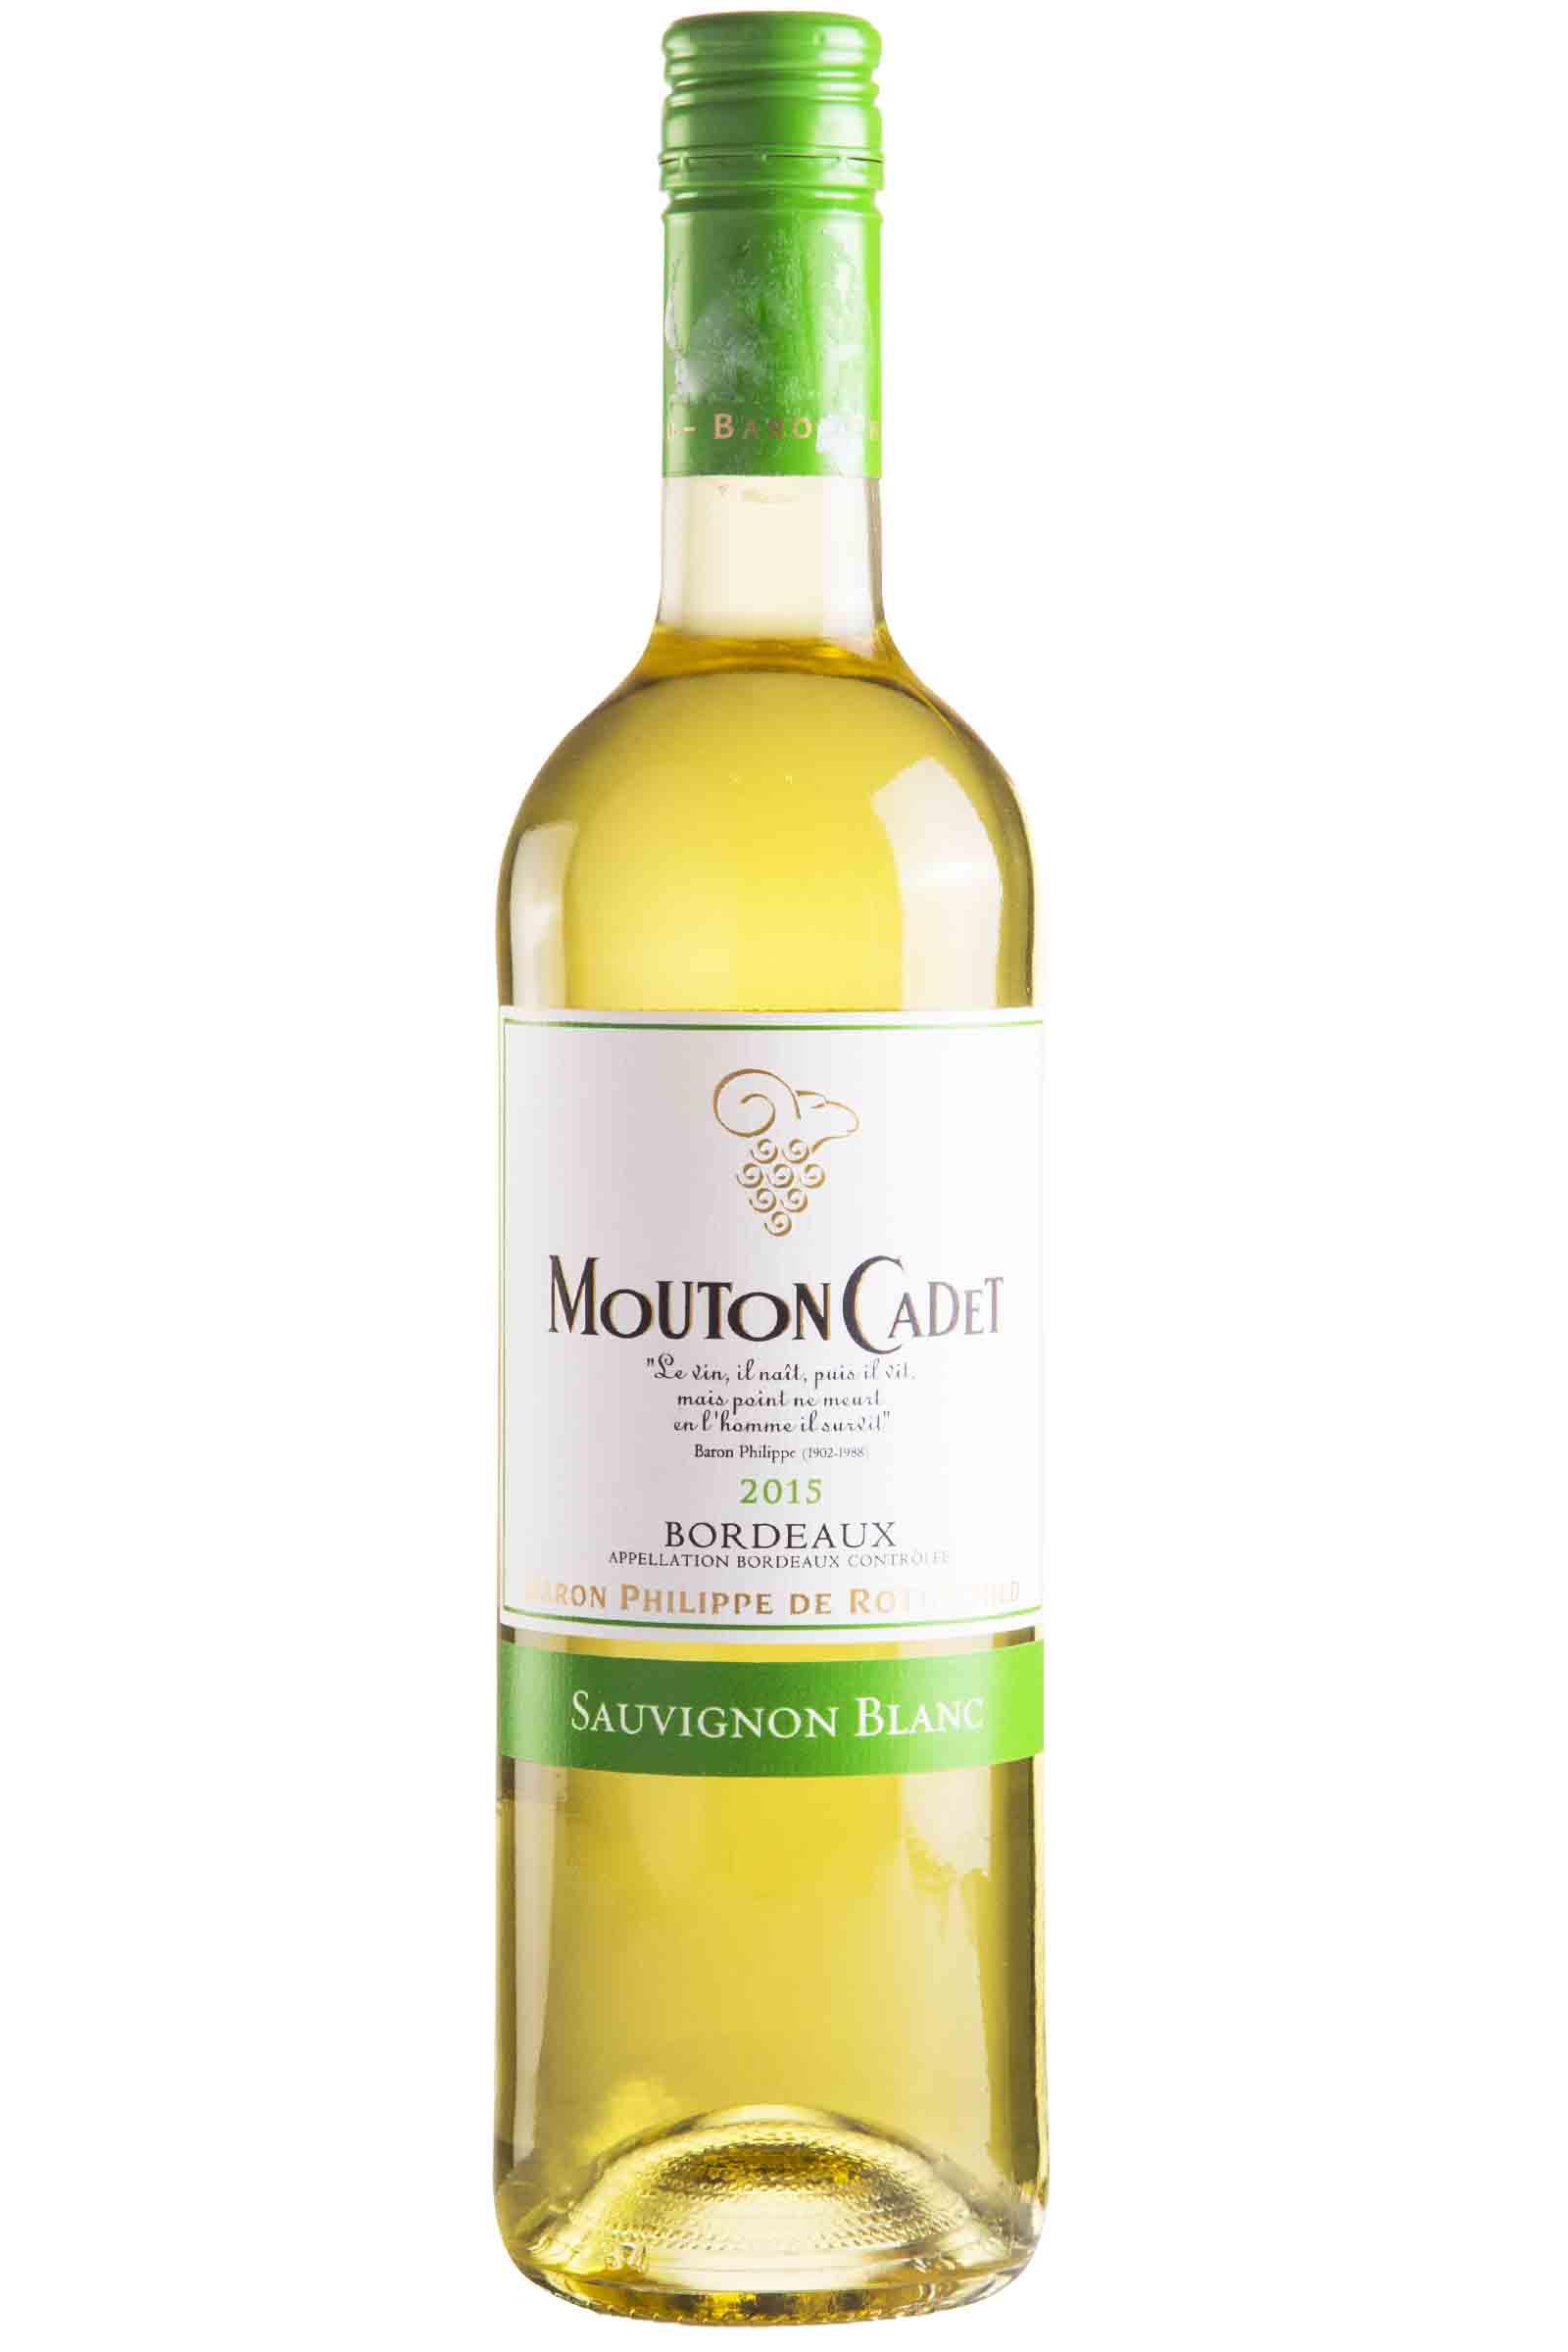 Vino Mouton Cadet Sauvignon Blanc 750ml